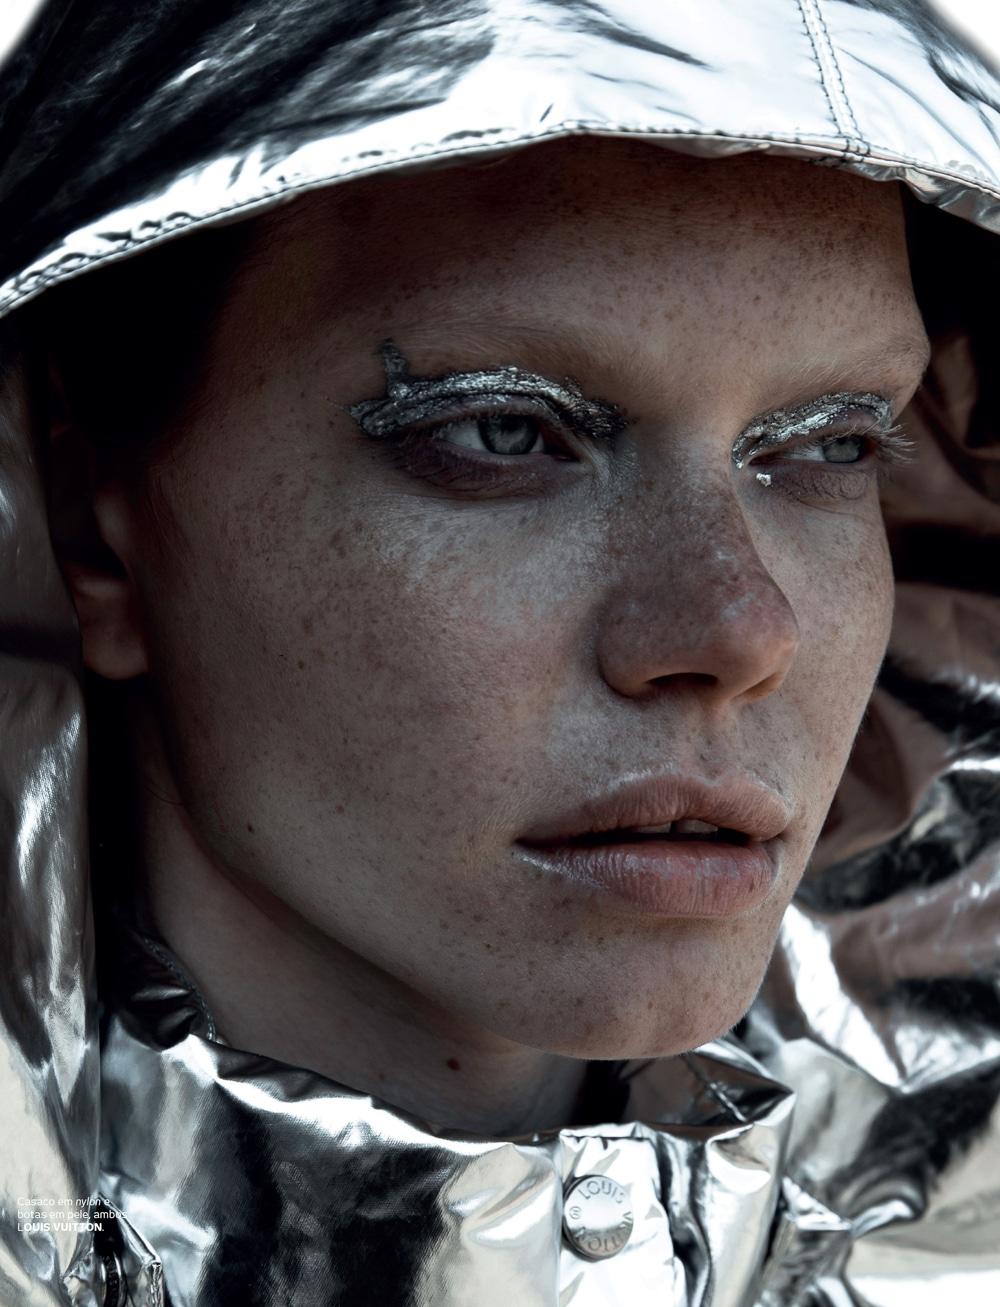 Vogue-Portugal-Nika-Rusakova-Filip-Koludrovic-2.jpg